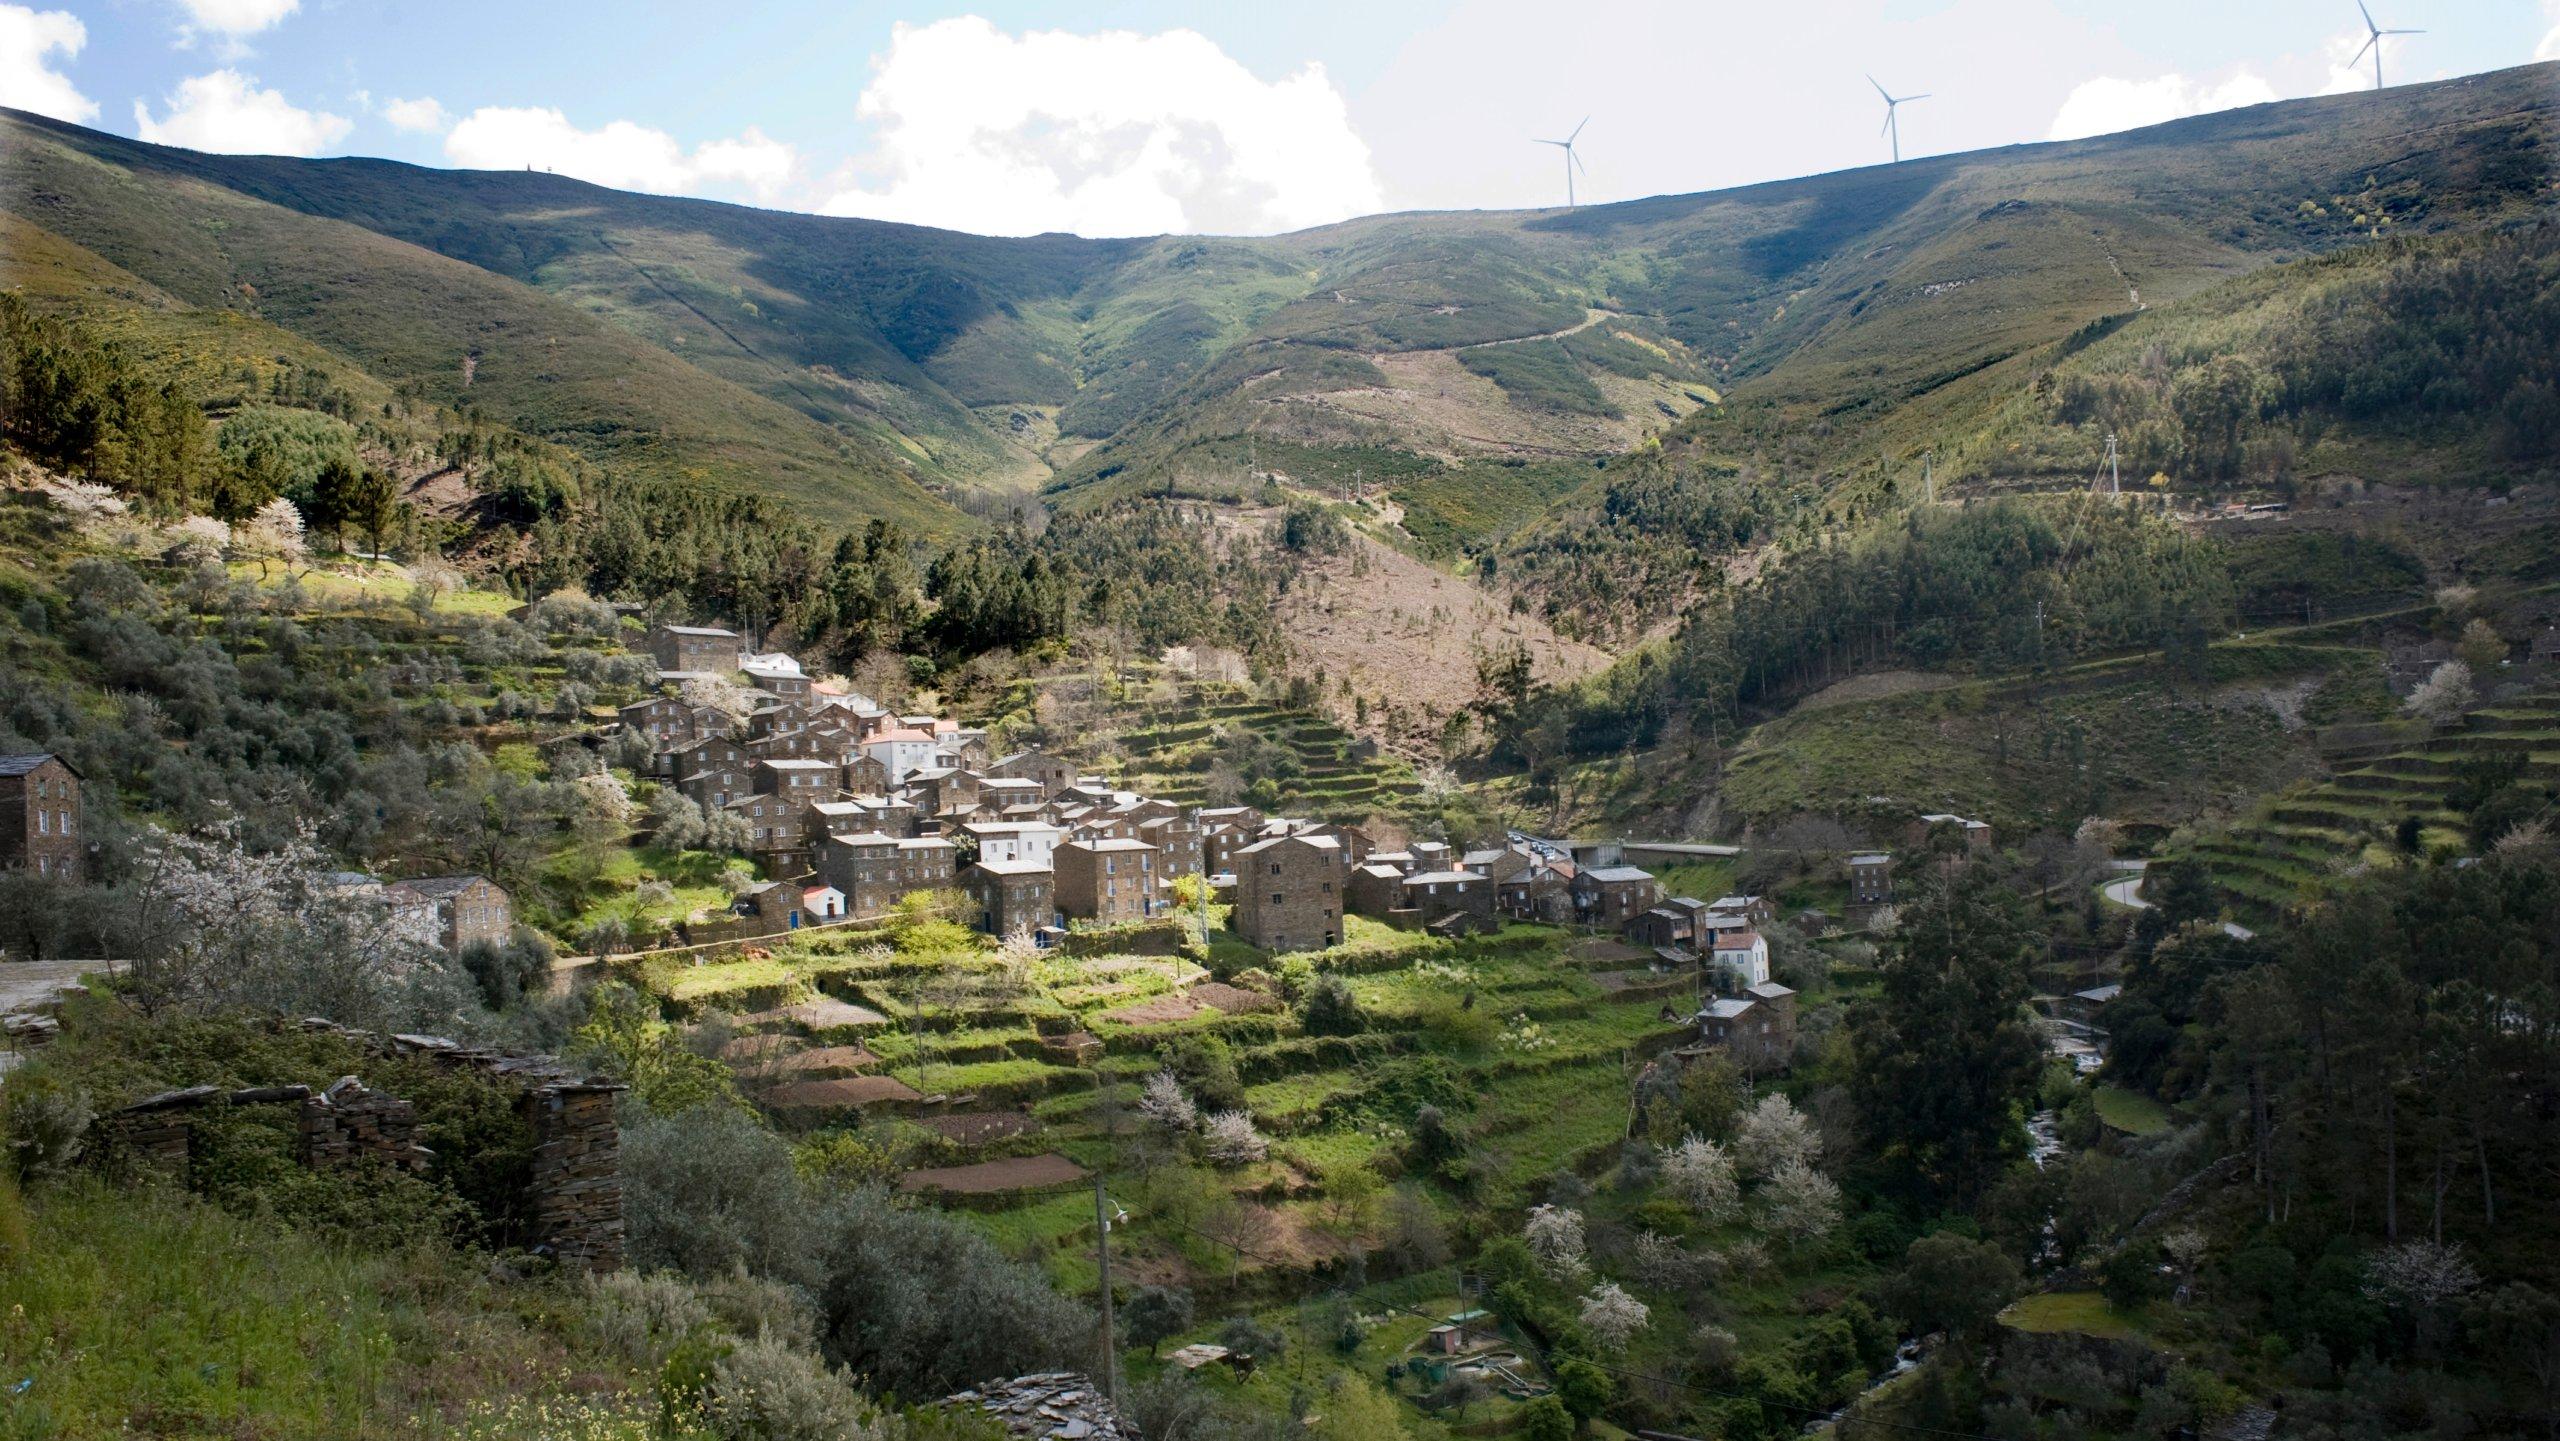 Piódão (Piodao) is a small village of less than 200